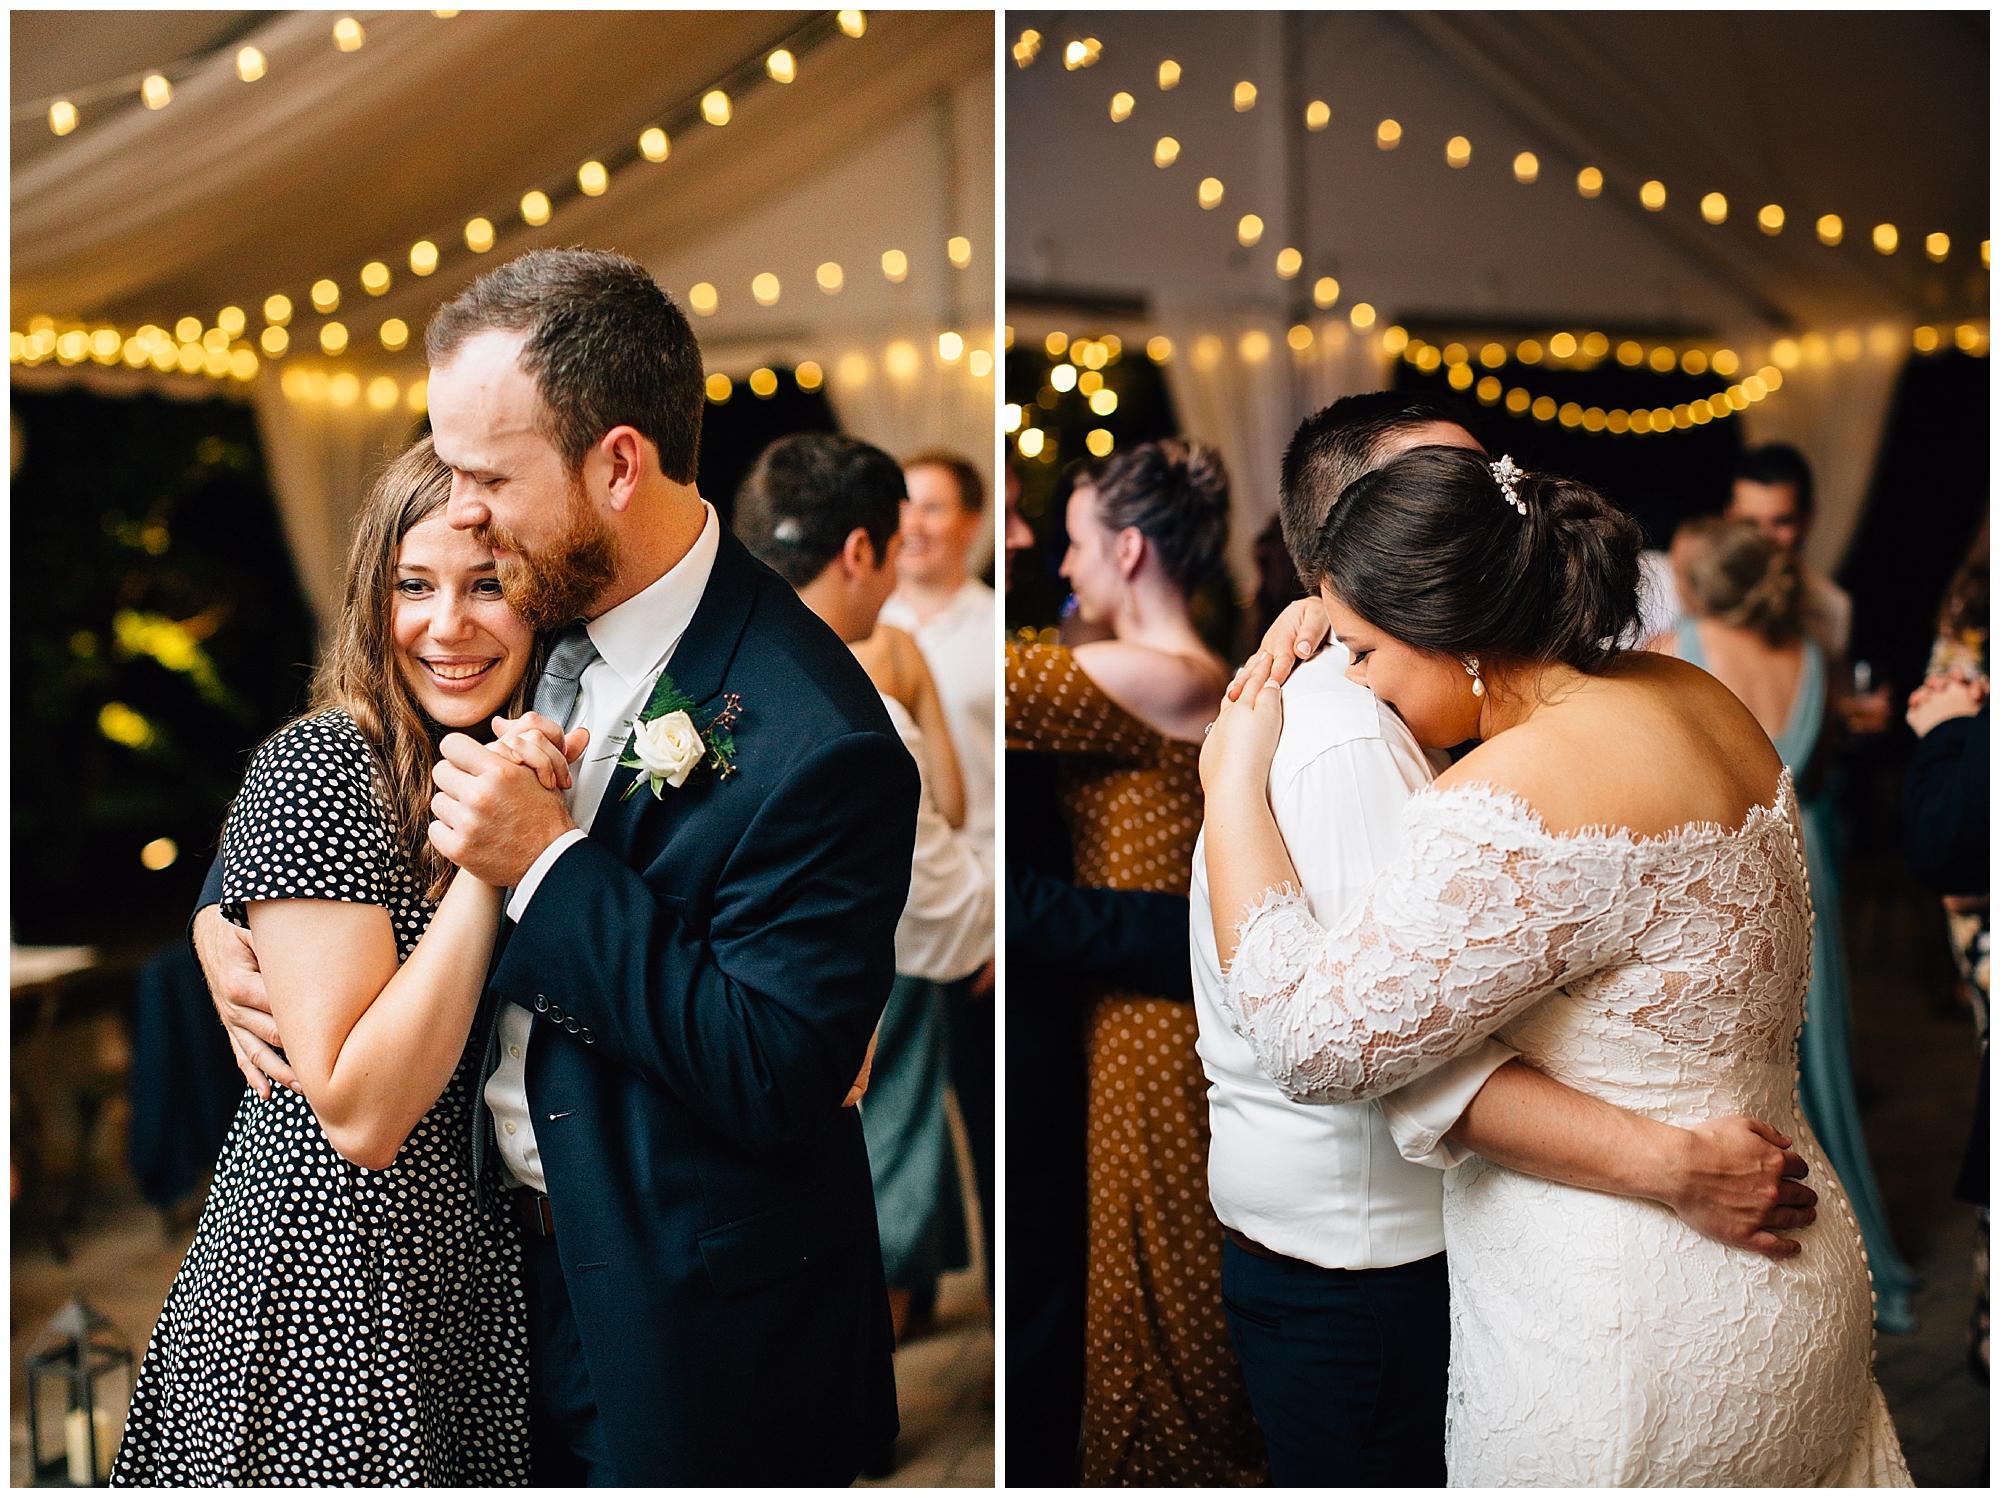 Oaks-at-salem-wedding-apex-photography-122.jpg